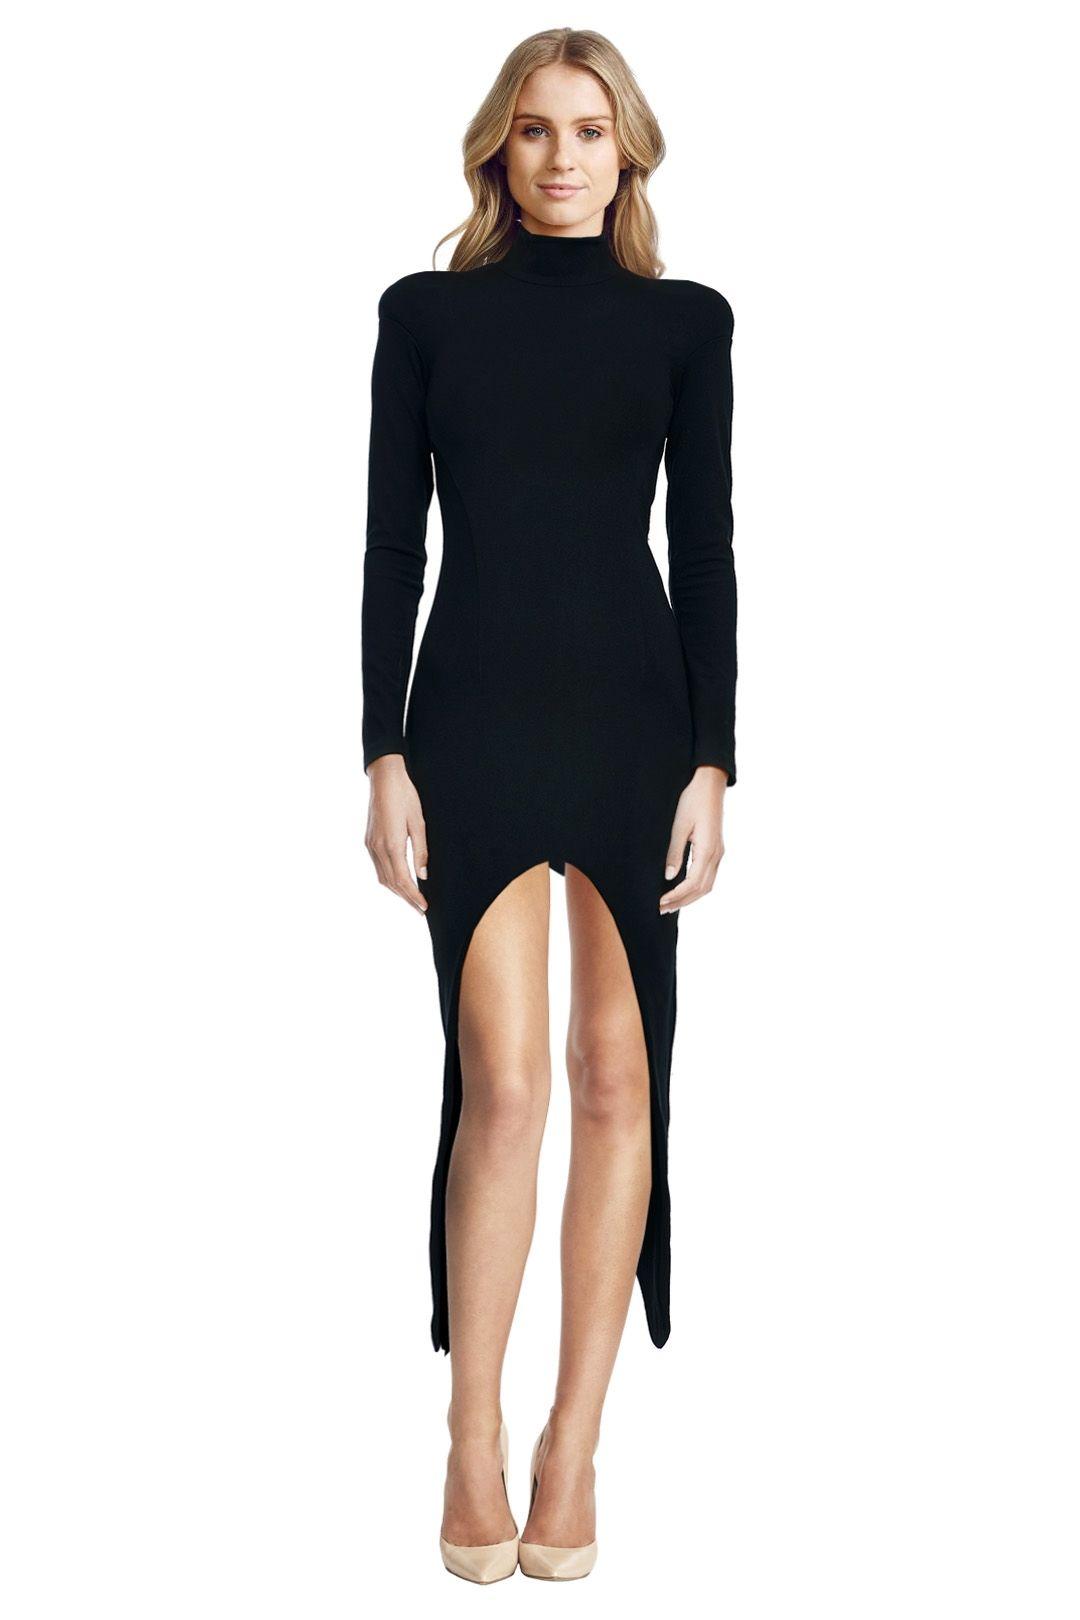 Misha Collection - Allegra Dress - Black - Front